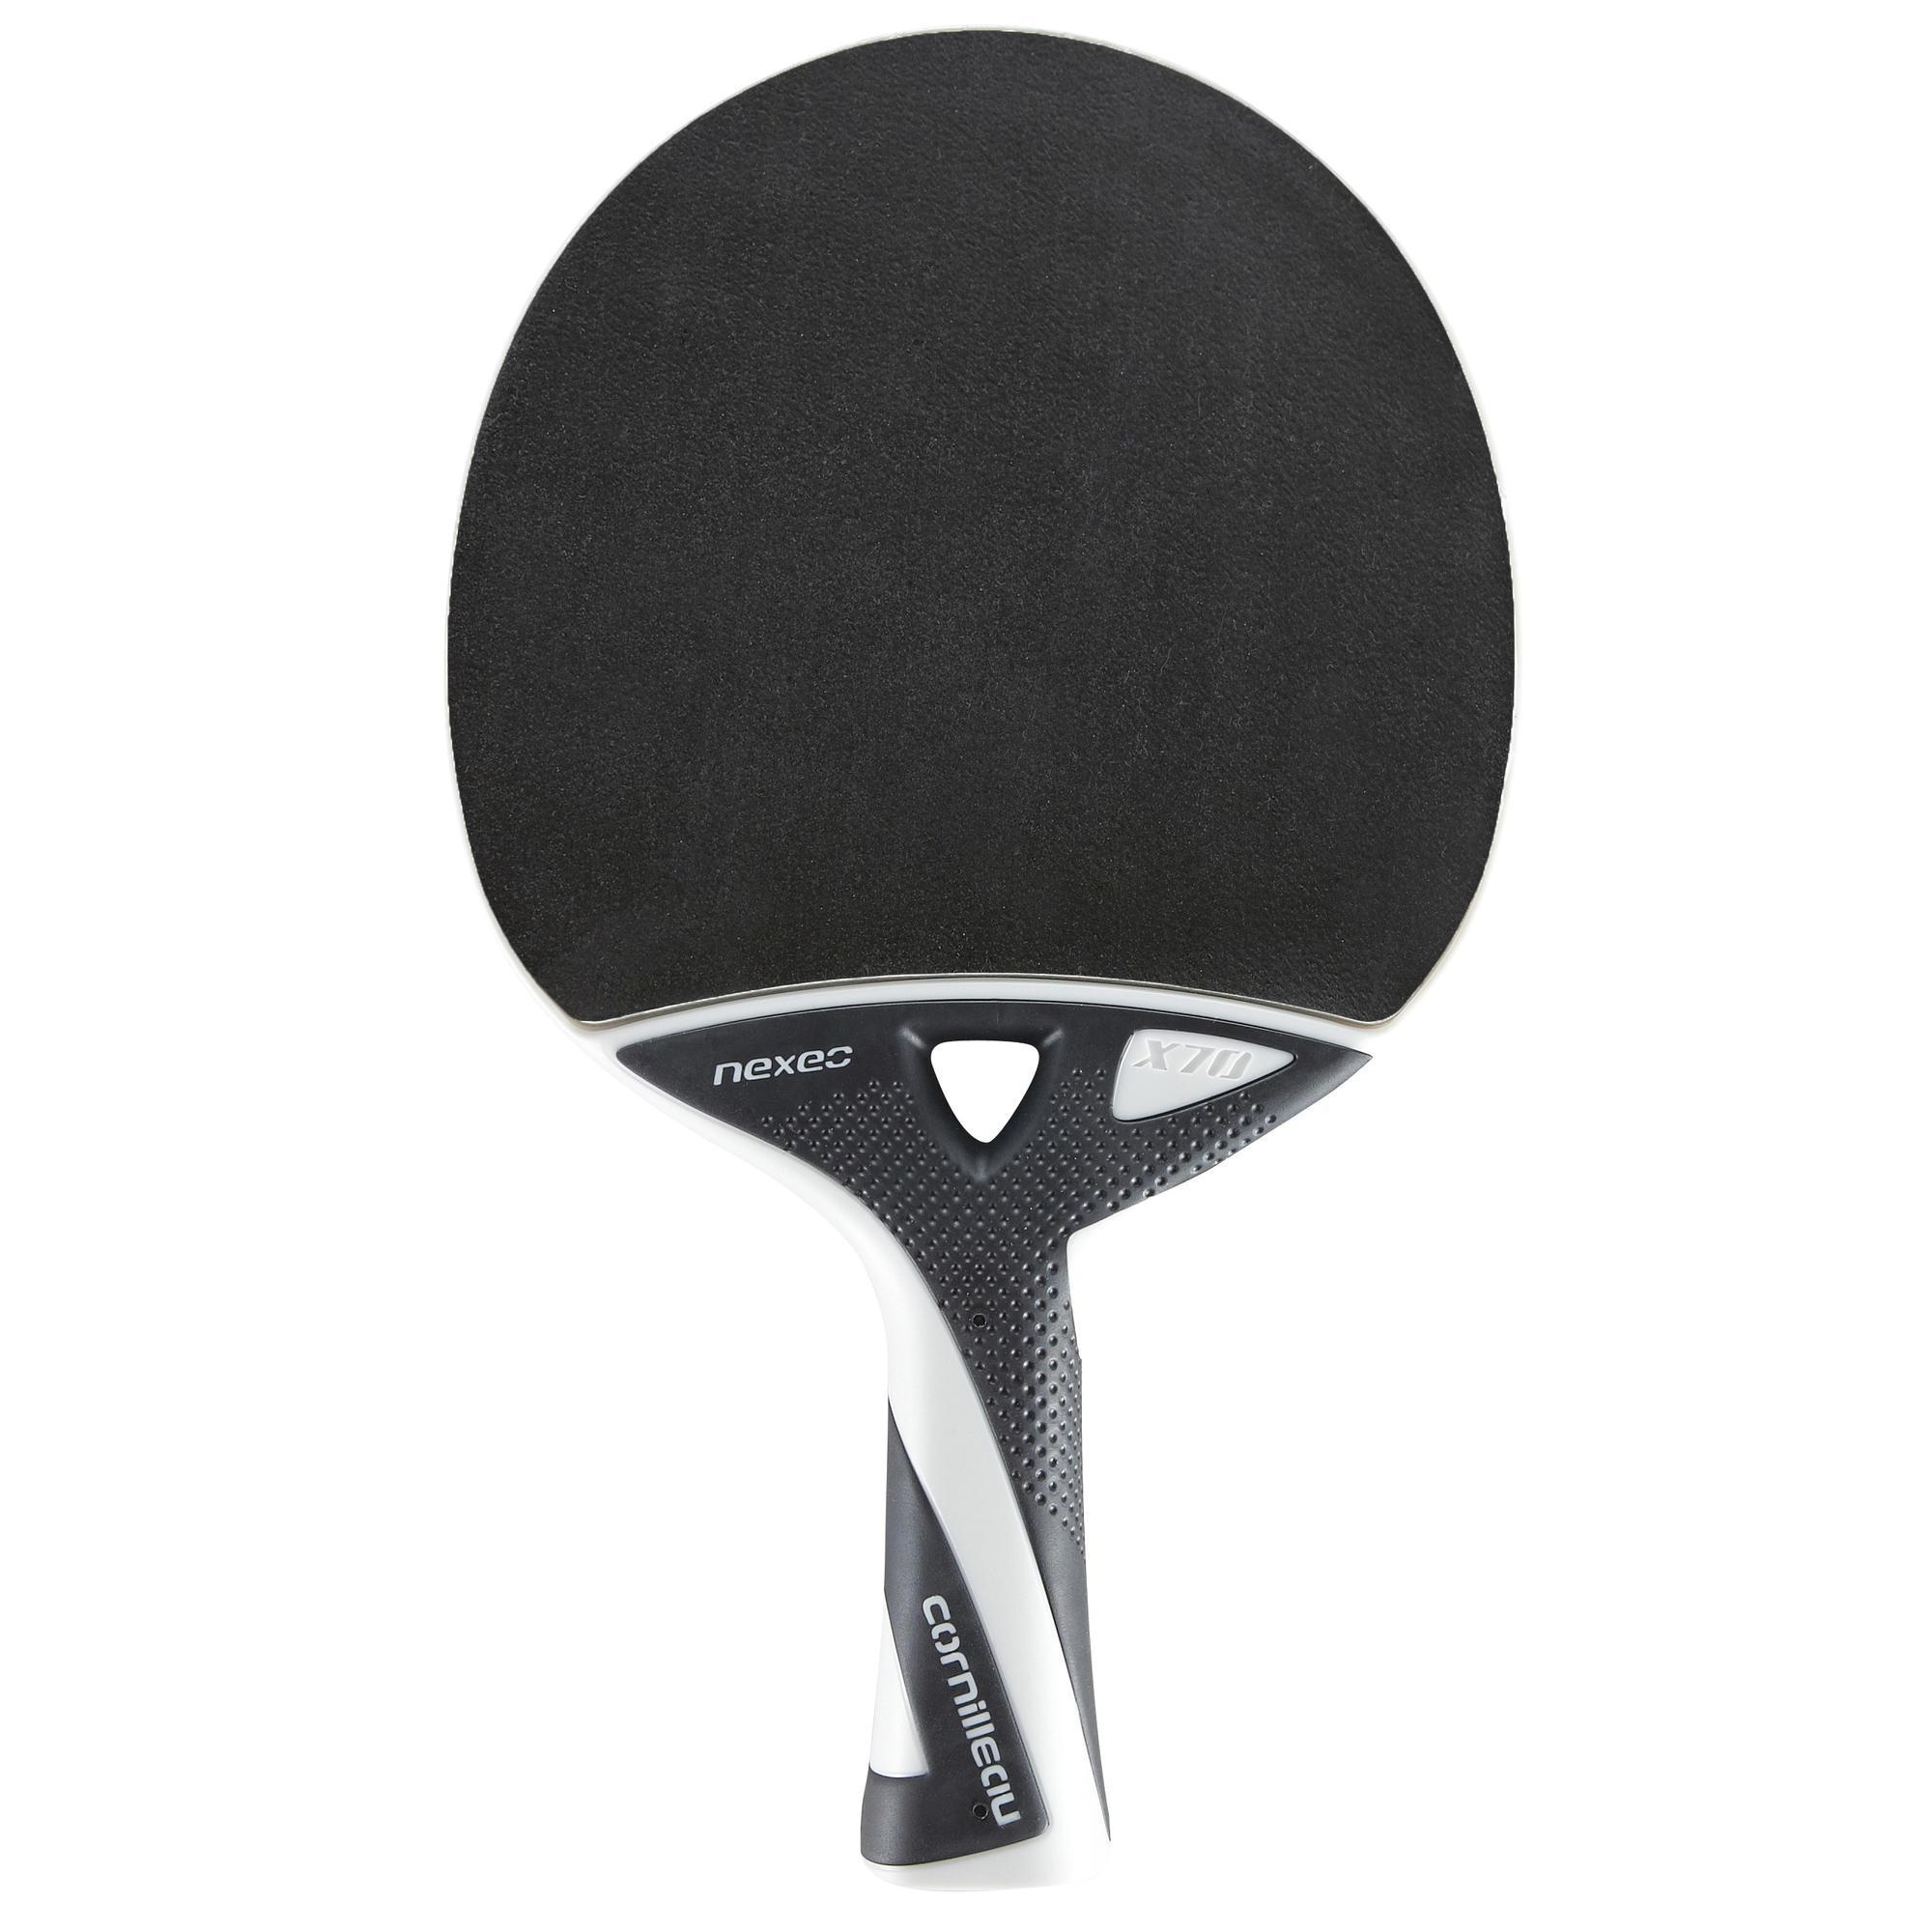 Cornilleau raquette de tennis de table free nexeo x70 outdoor decathlon - Raquette de tennis de table decathlon ...